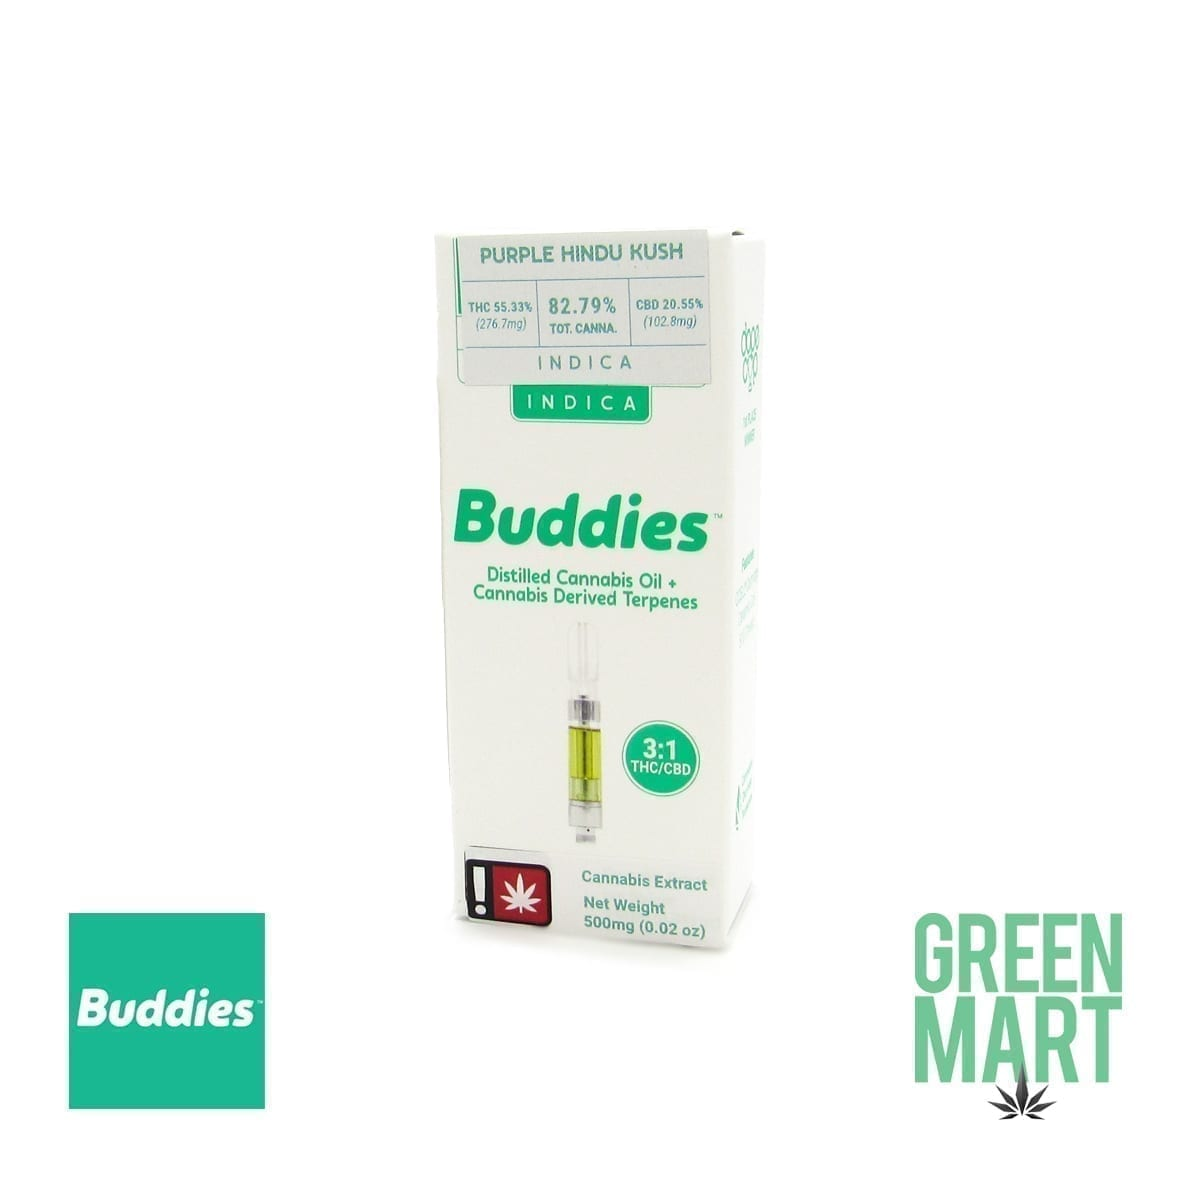 Buddies Brand Distillate Cartridge - Purple Hindu Kush